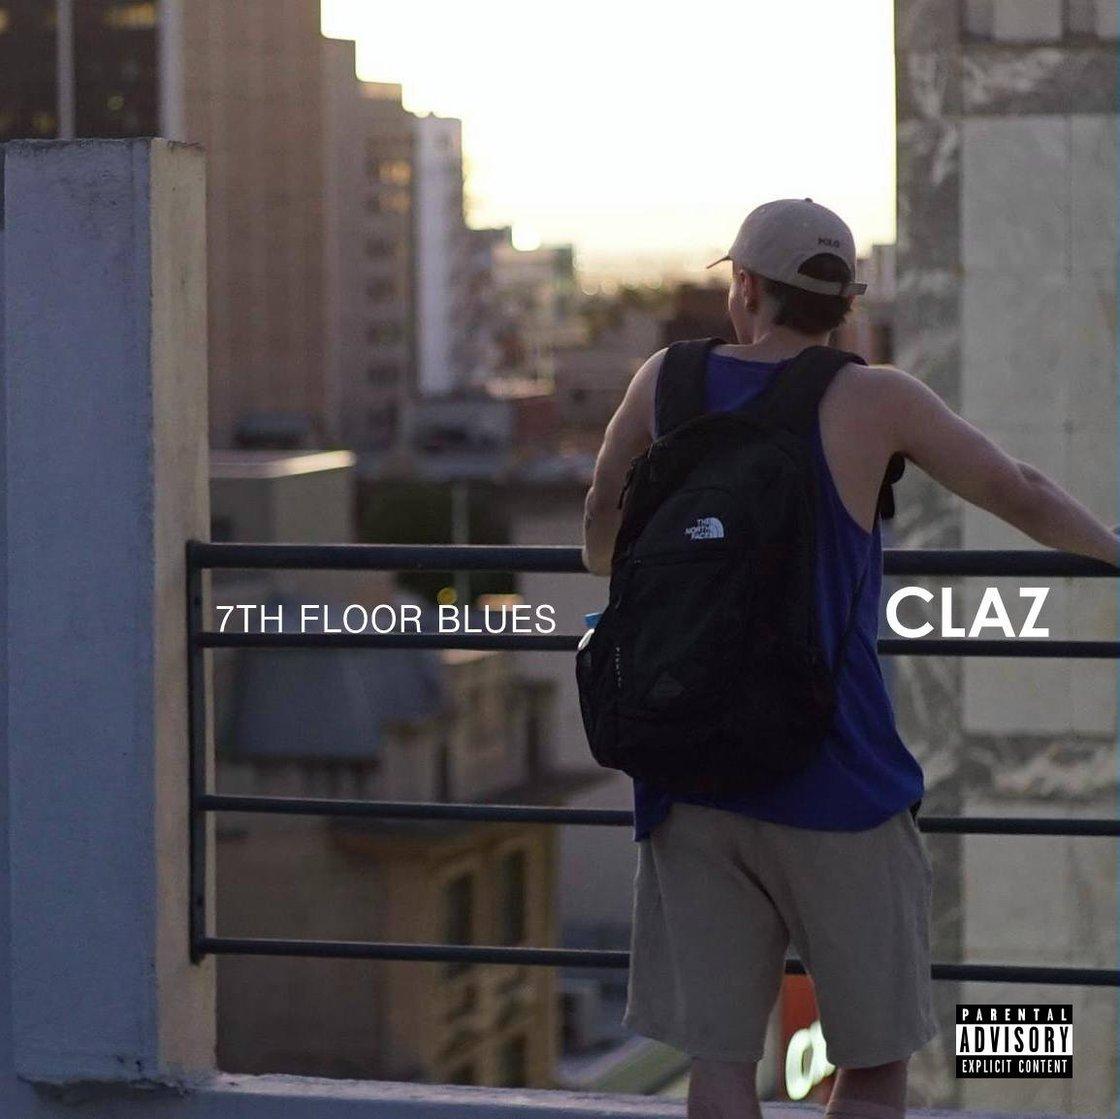 Image of '7th Floor Blues' CD